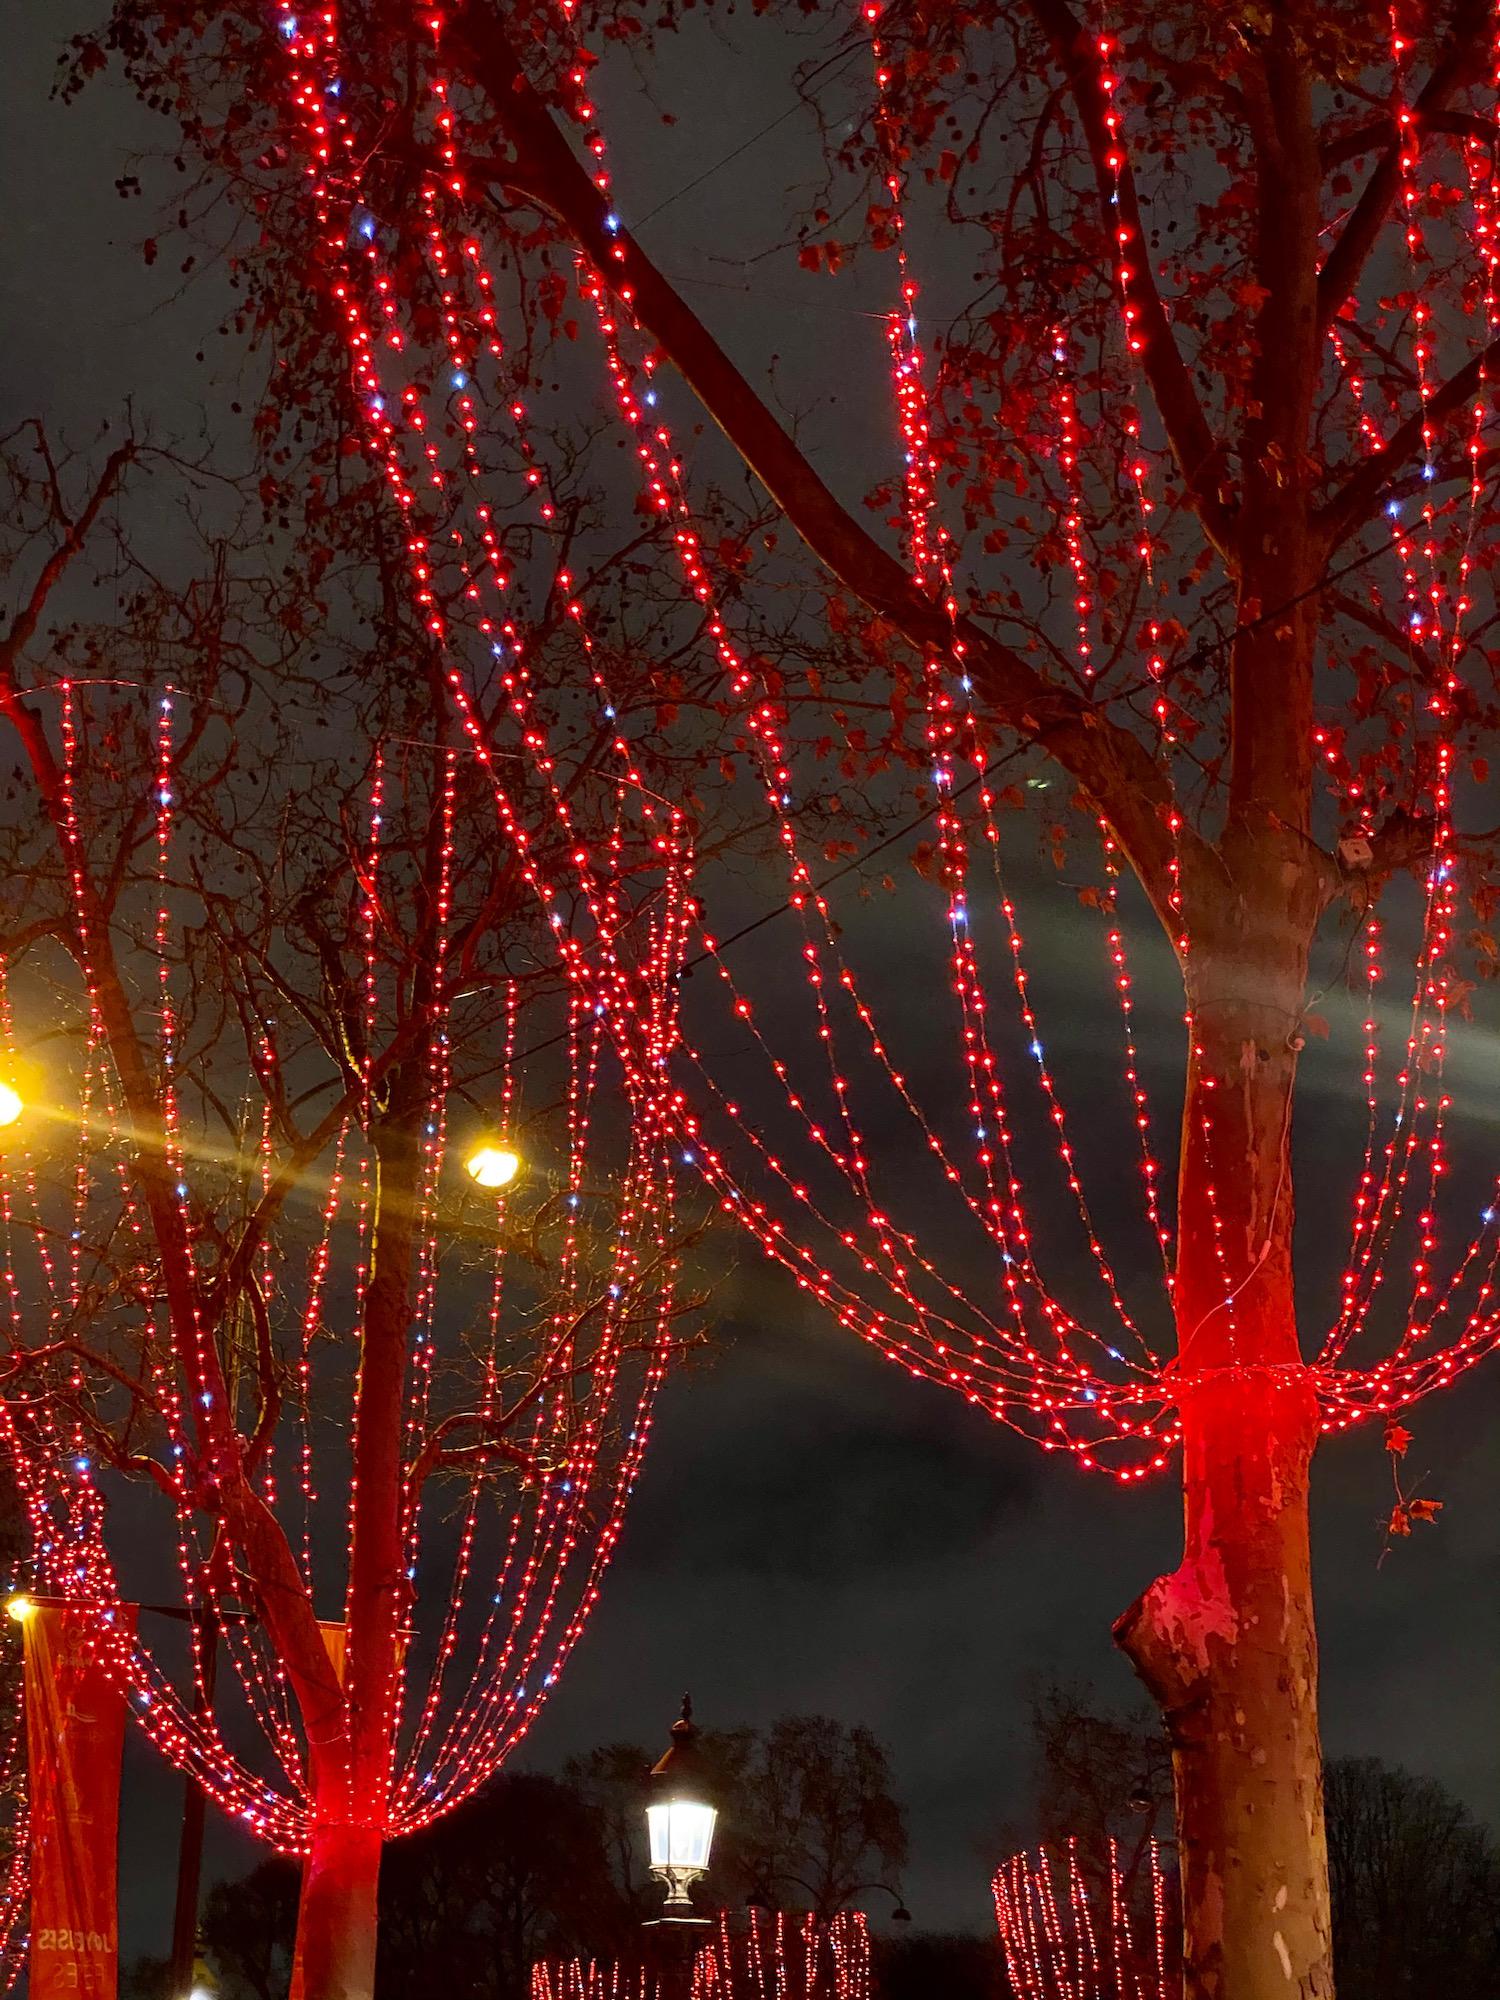 champs-élysées christmas lights